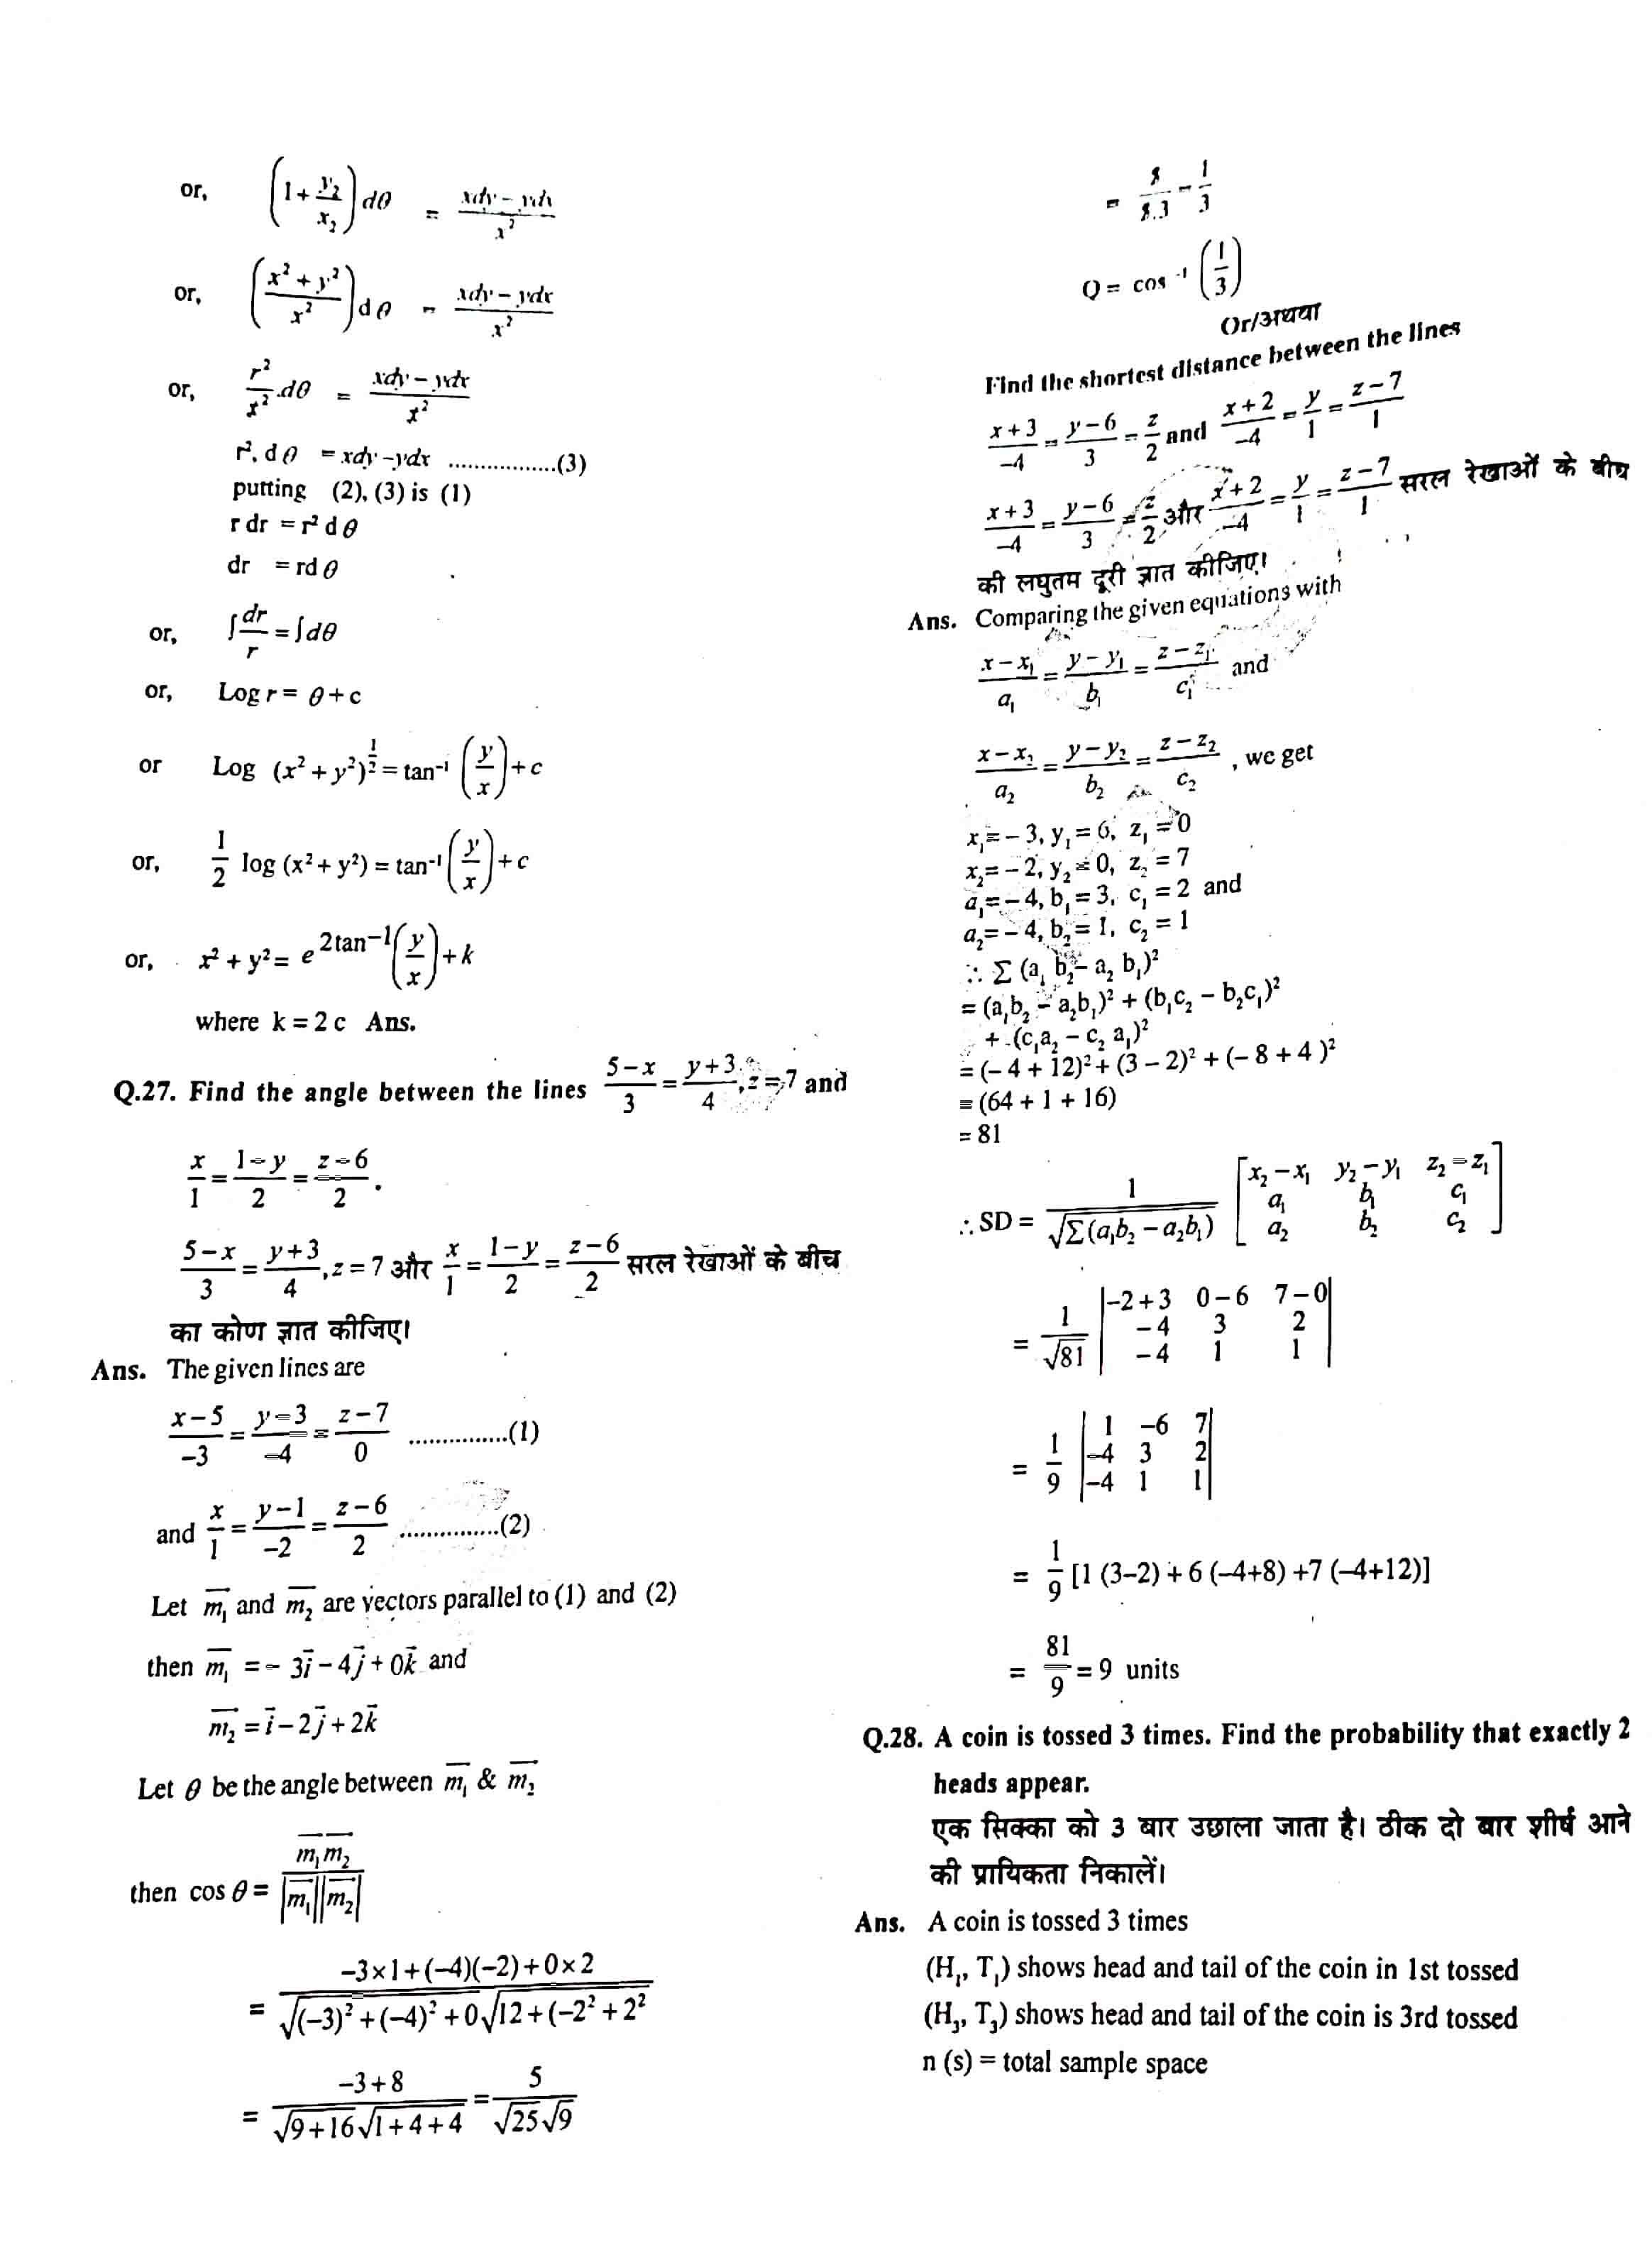 JAC Class 12 math 2013 Question Paper 08